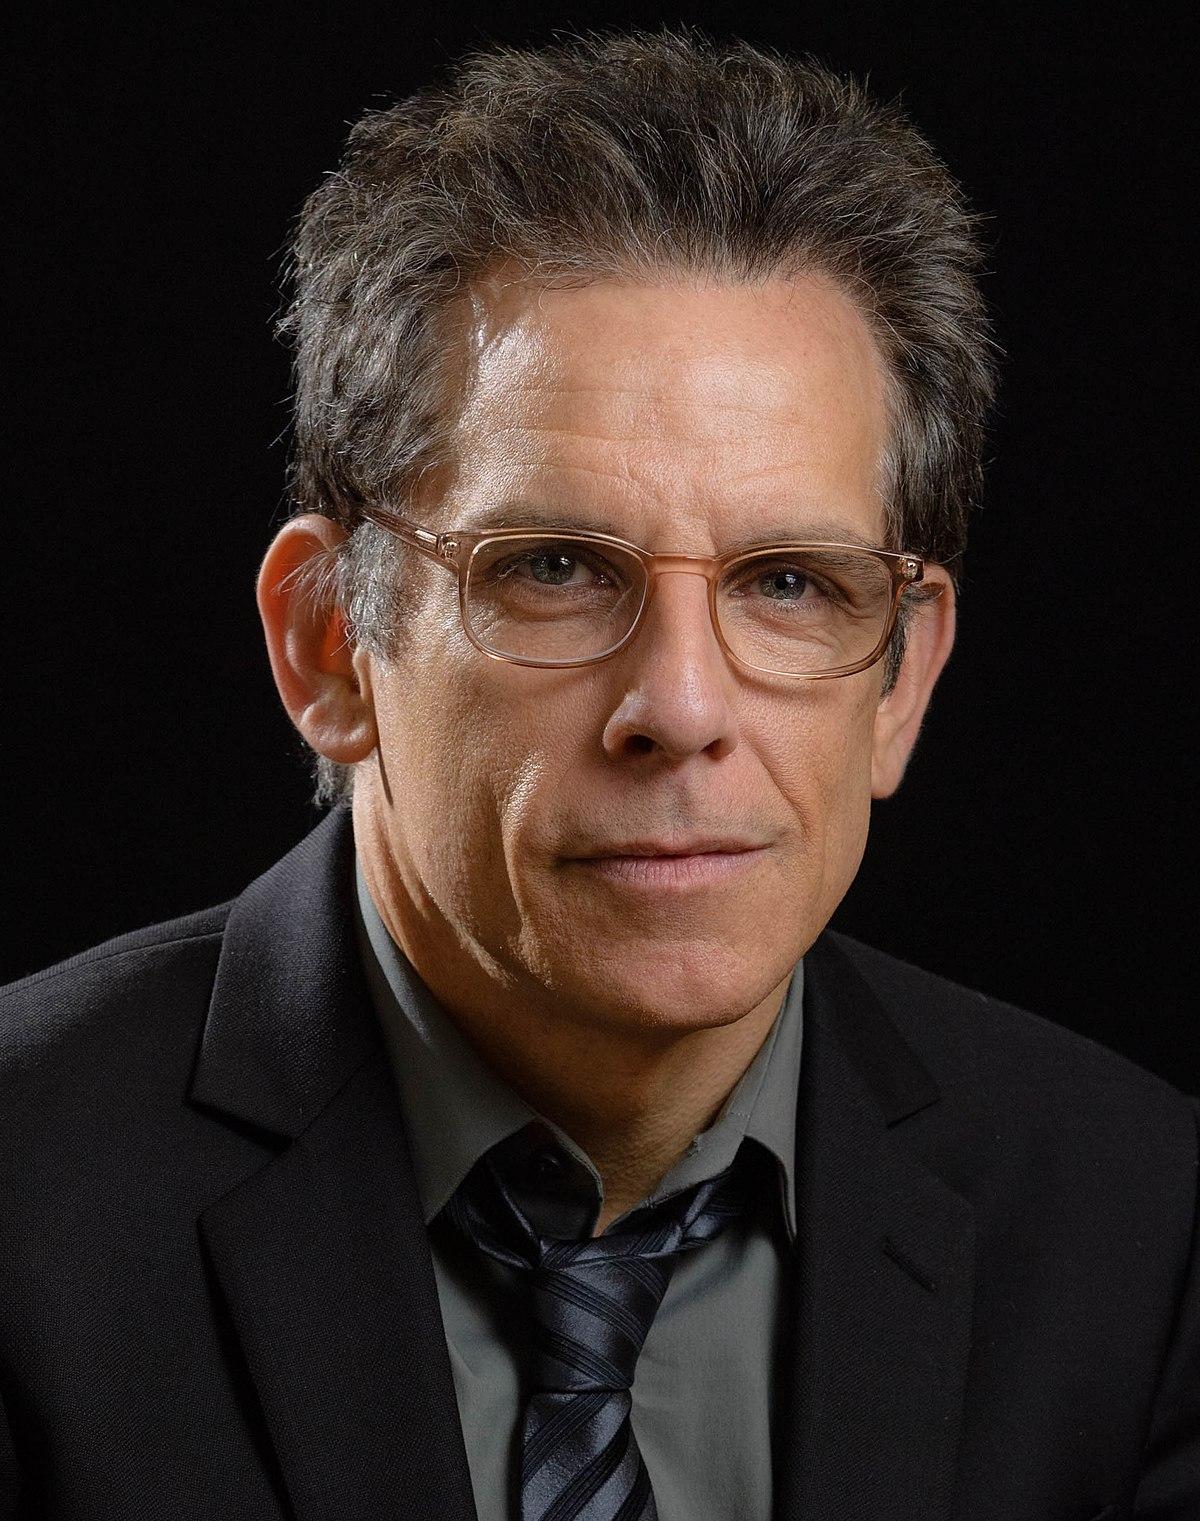 Ben Stiller Wikipedia